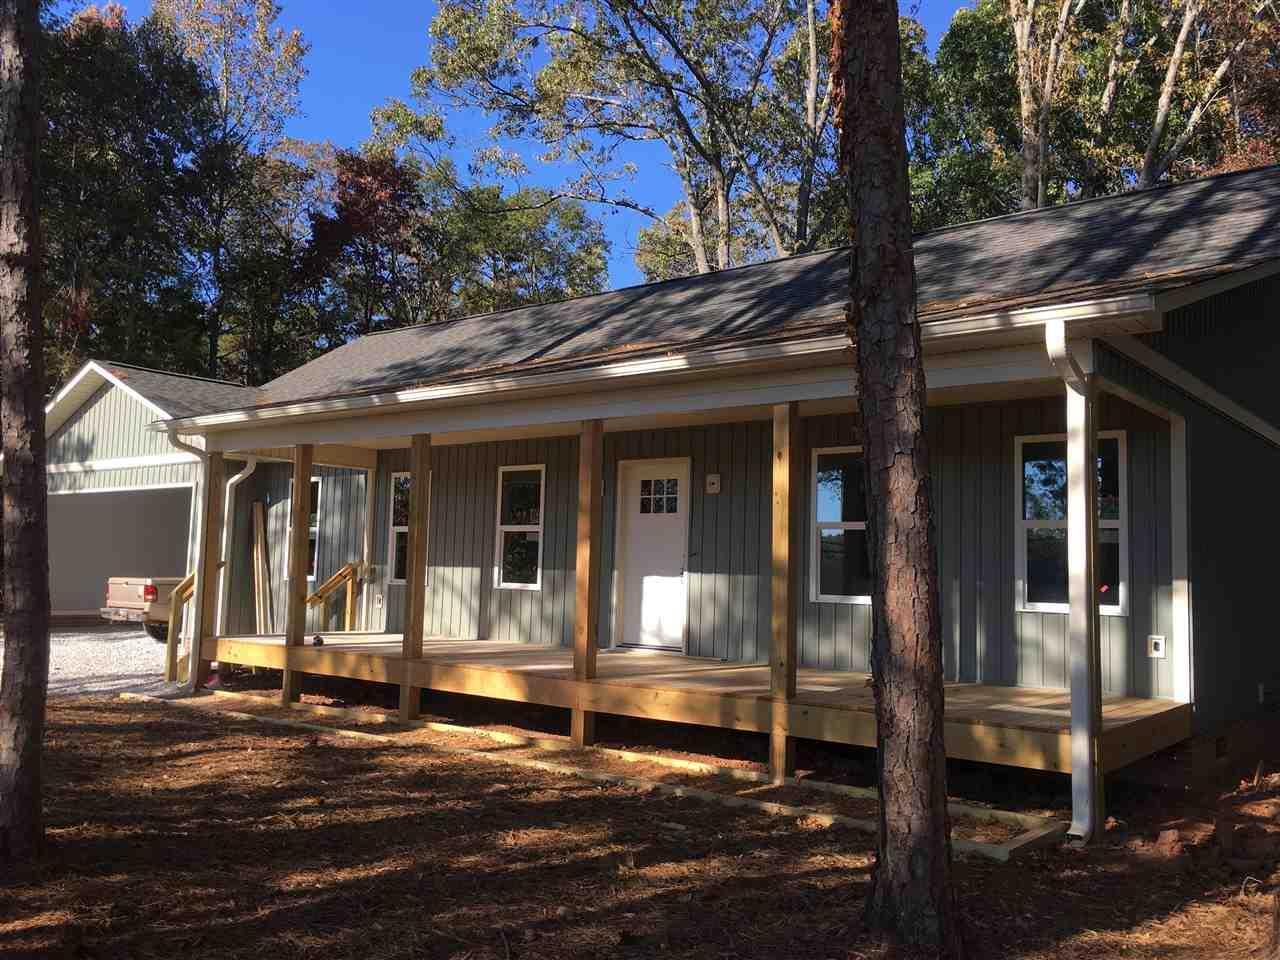 617 Cherry Road, Clemson, SC 29631 (MLS #20178382) :: Les Walden Real Estate